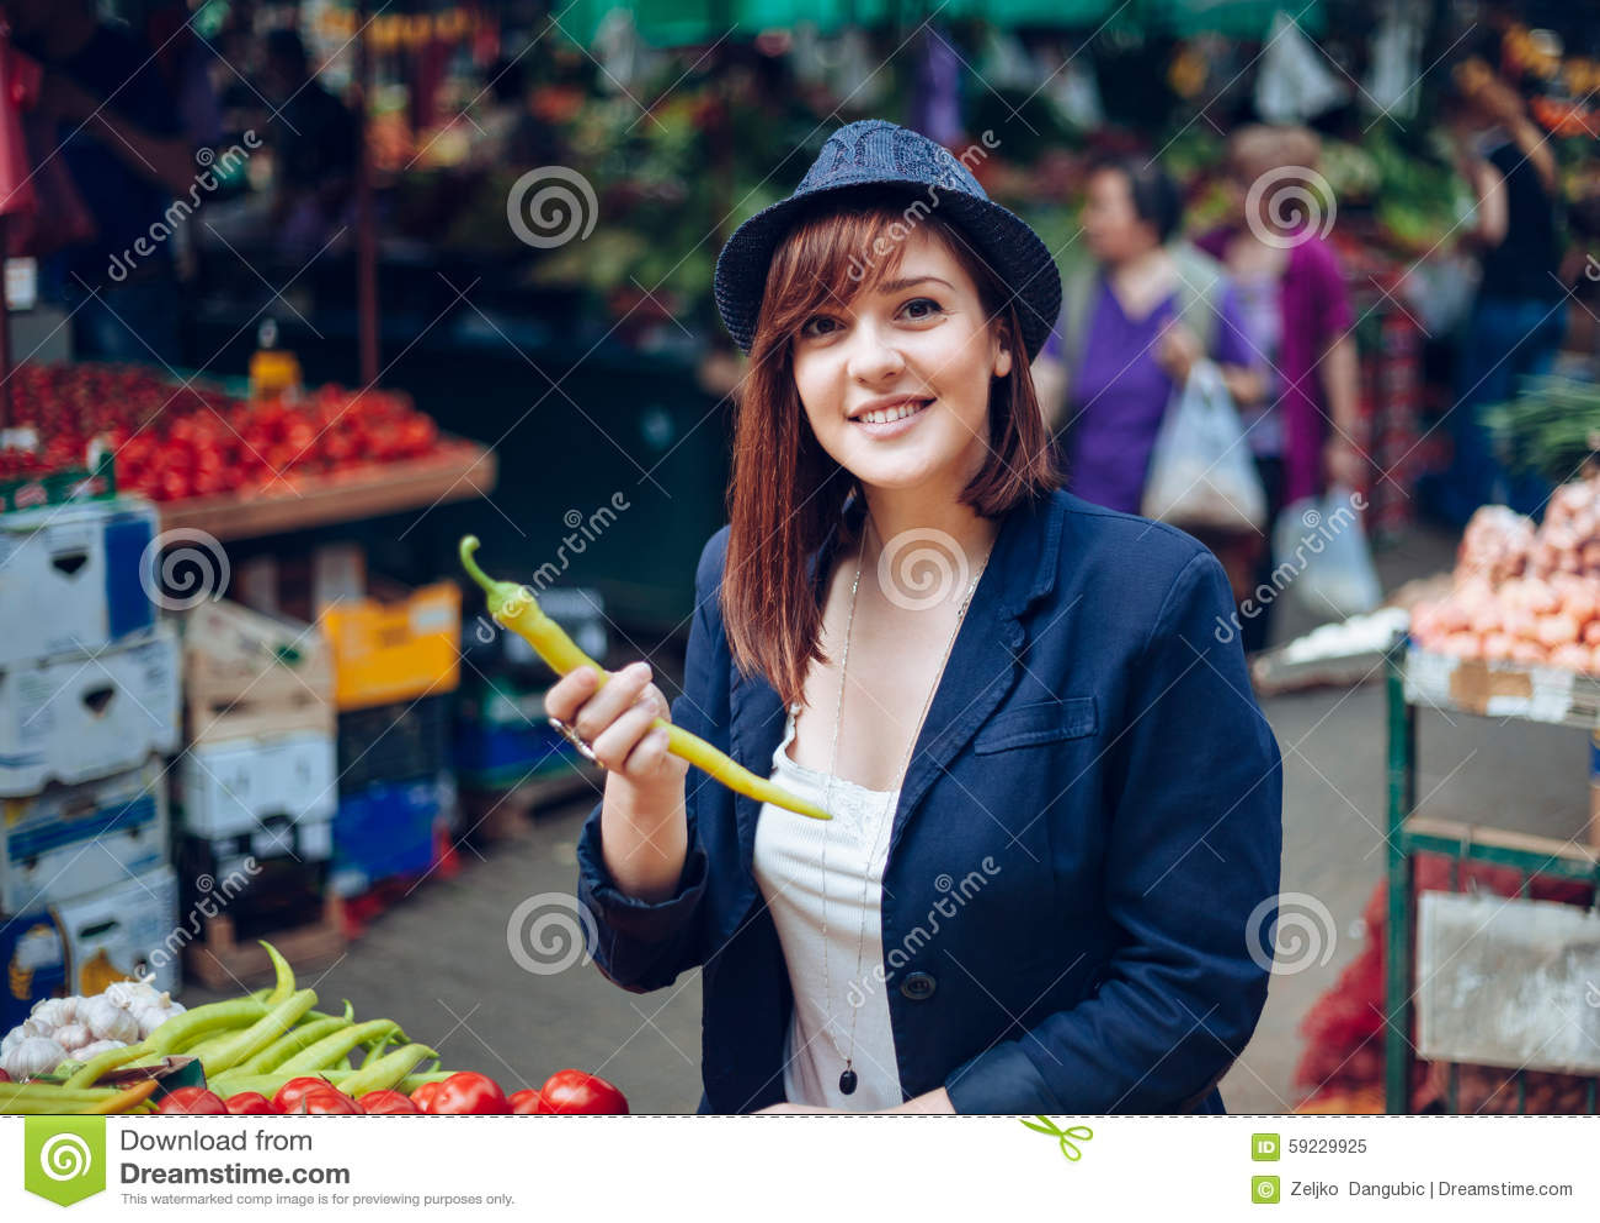 Download Hembra en Market Place imagen de archivo. Imagen de agricultura - 59229925